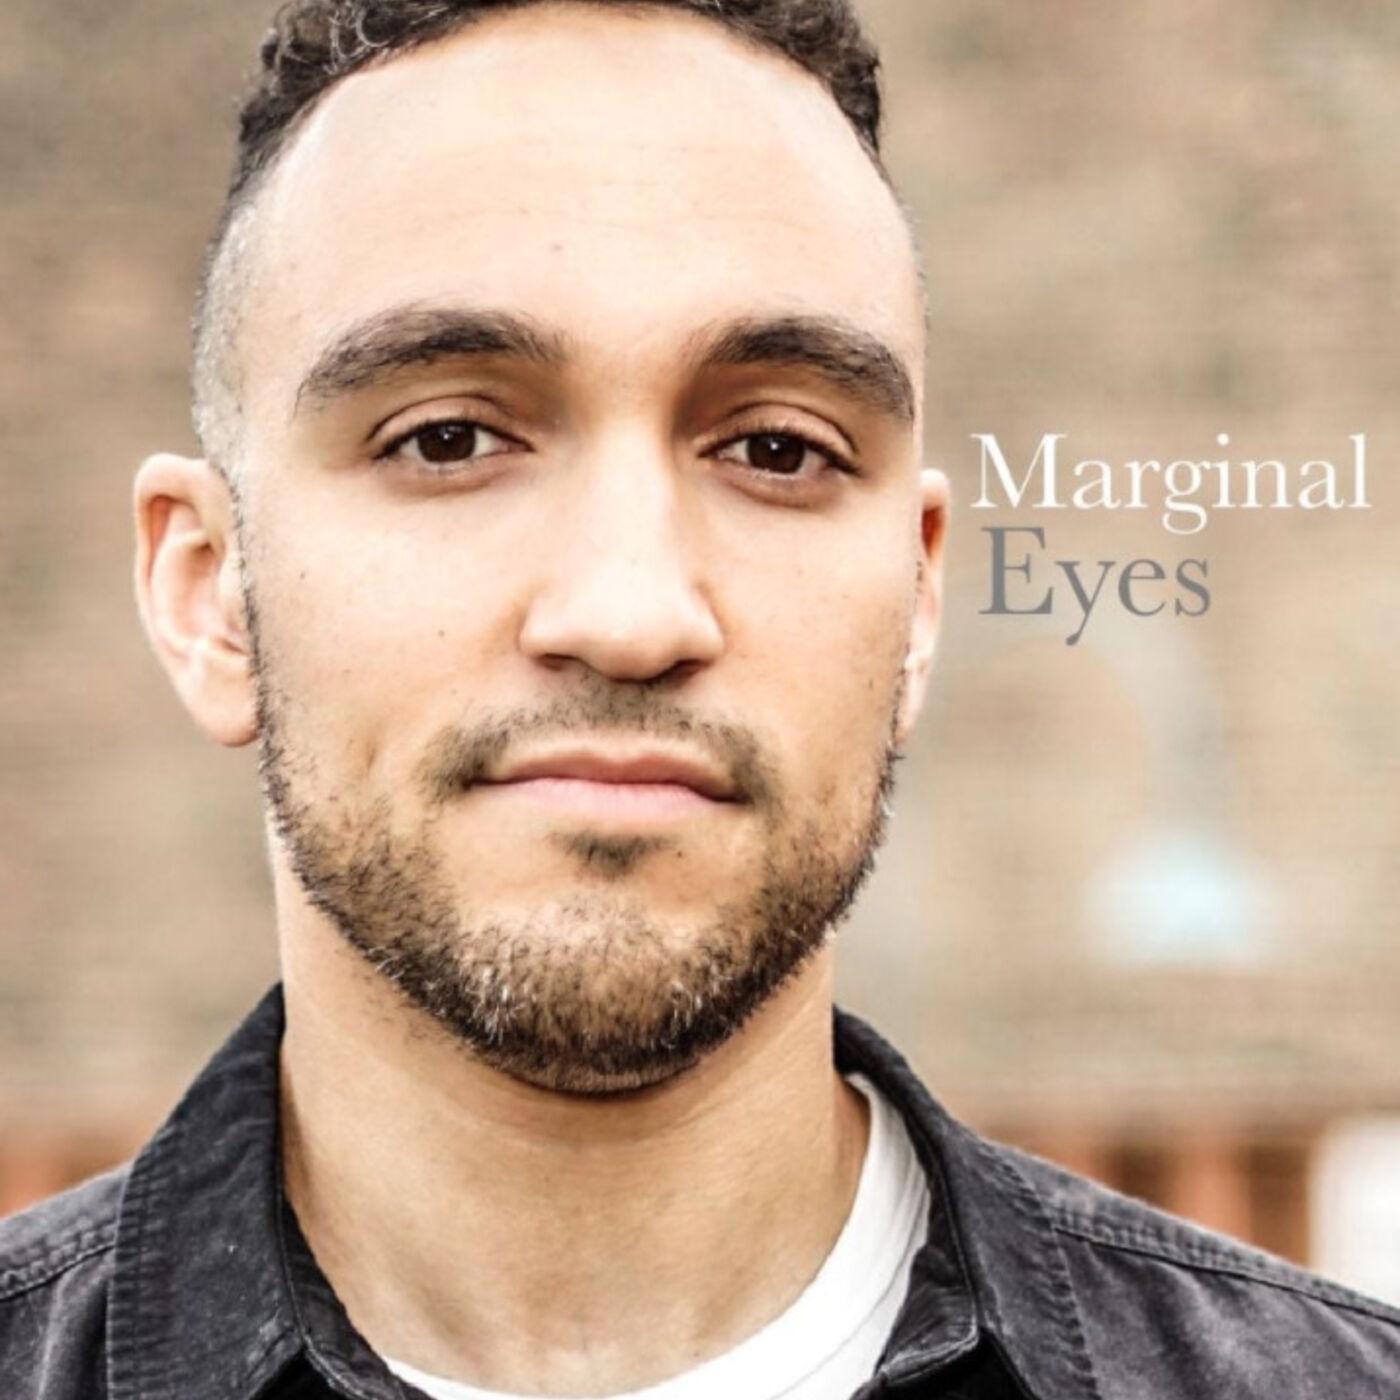 Aaron Keller / Author of Marginal Eyes